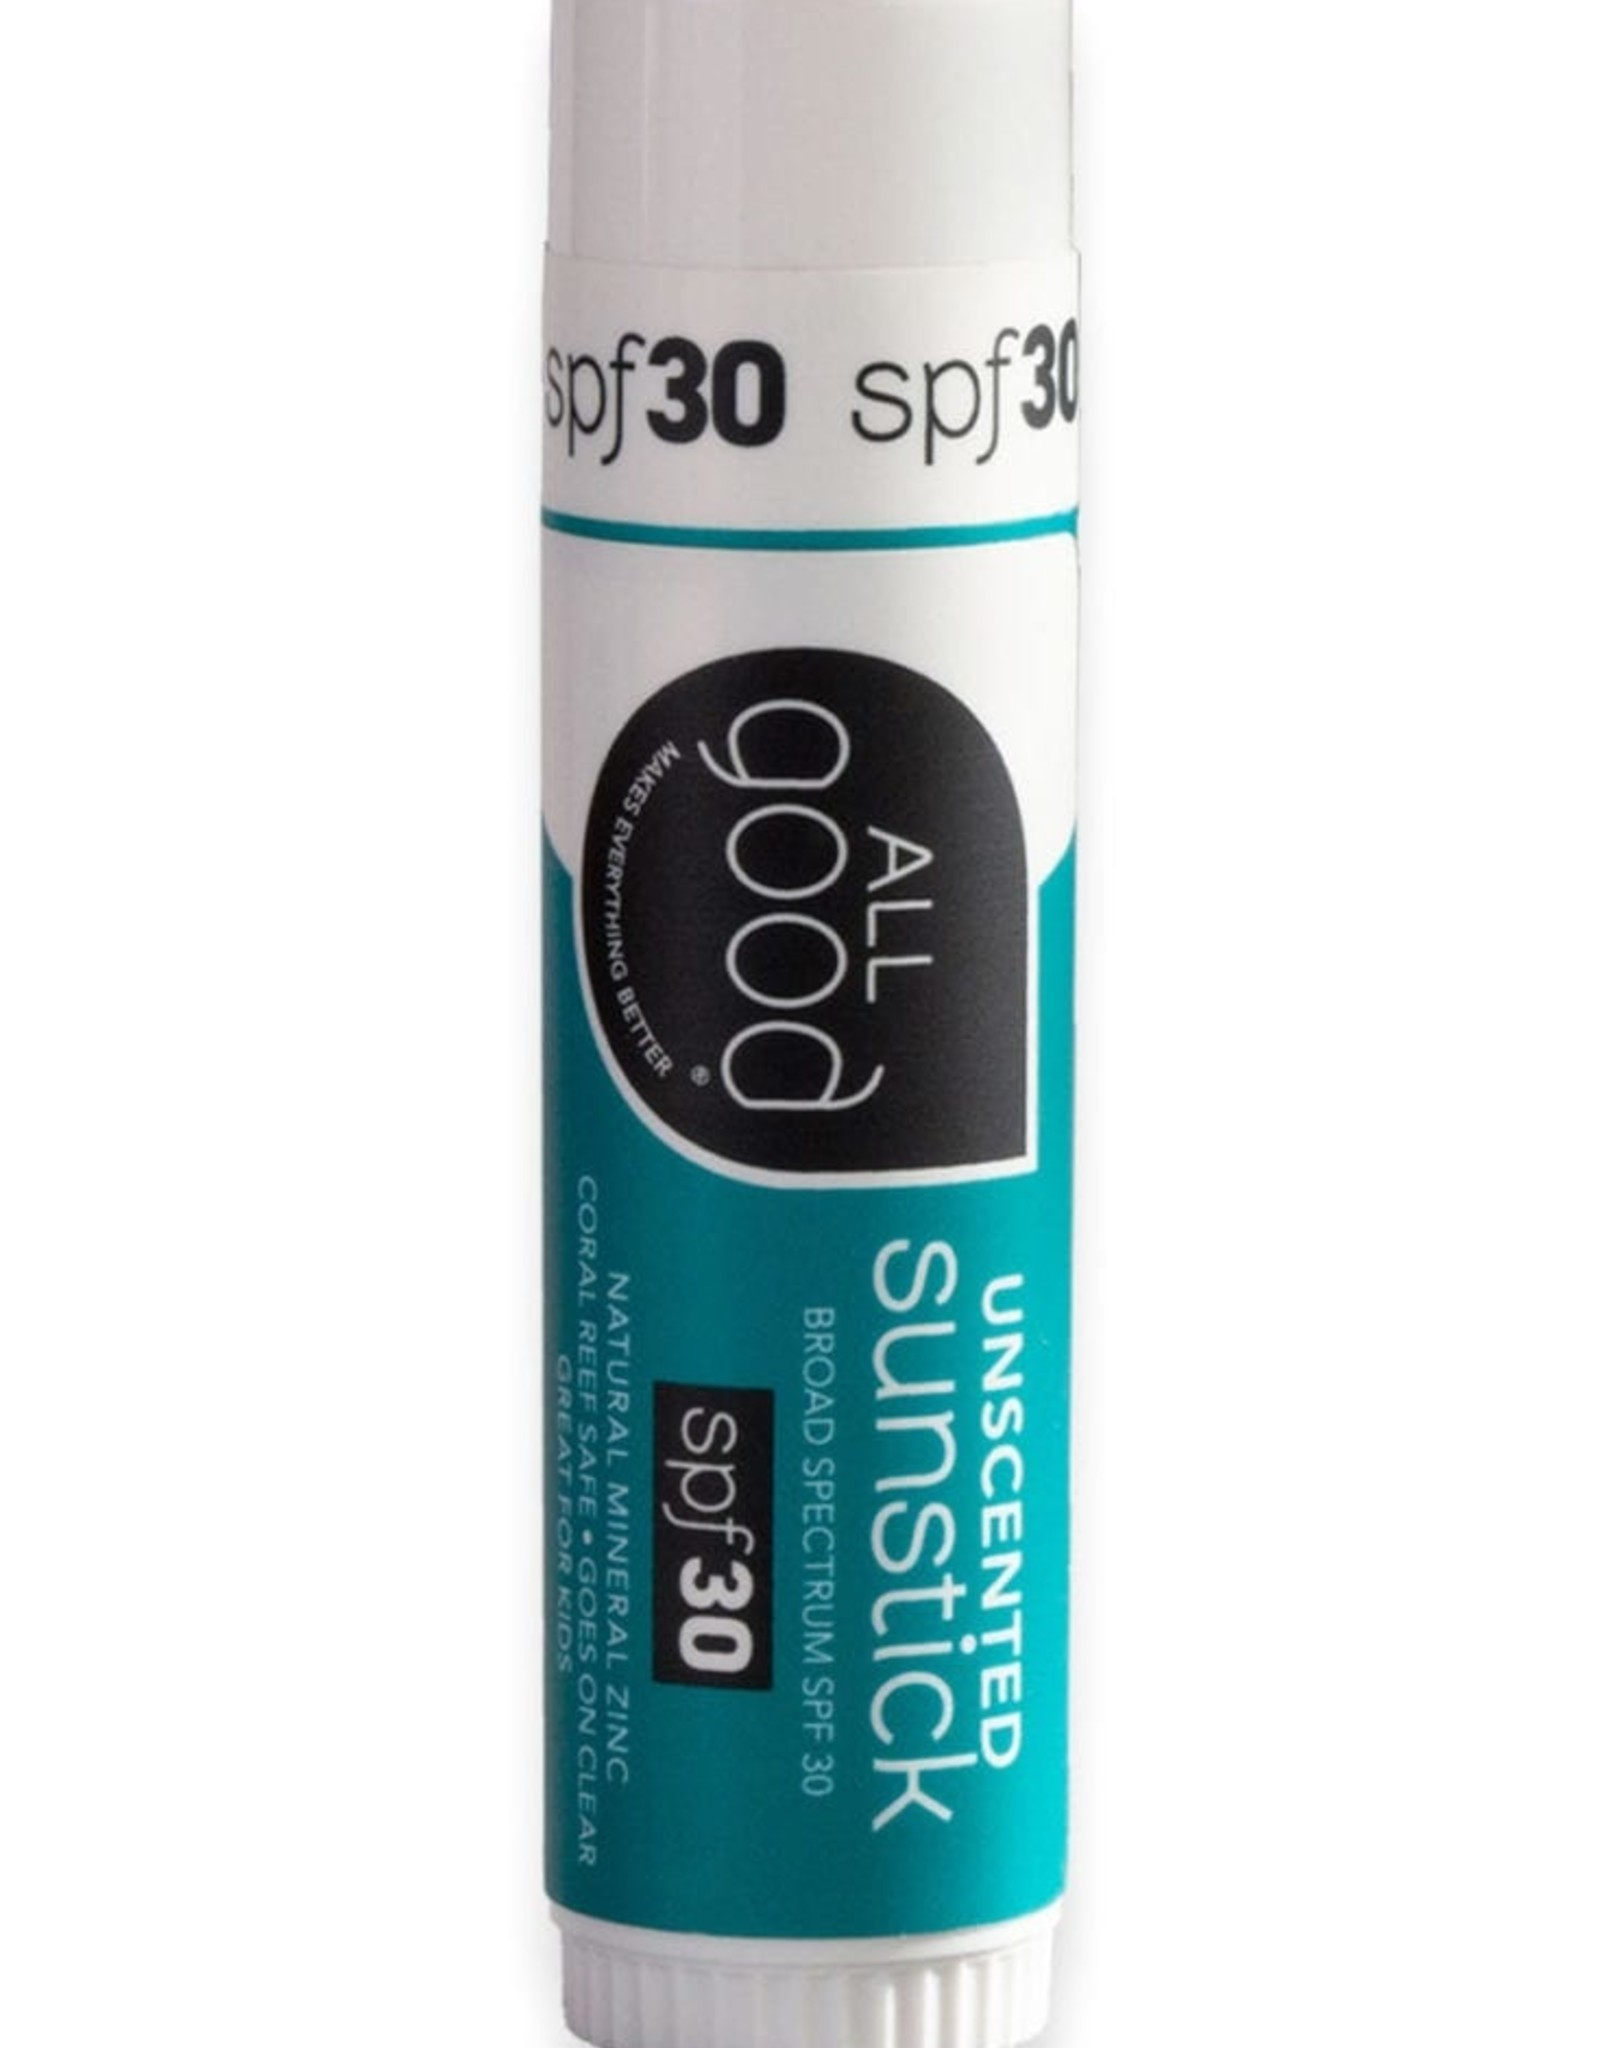 SPF 30 Sun Stick